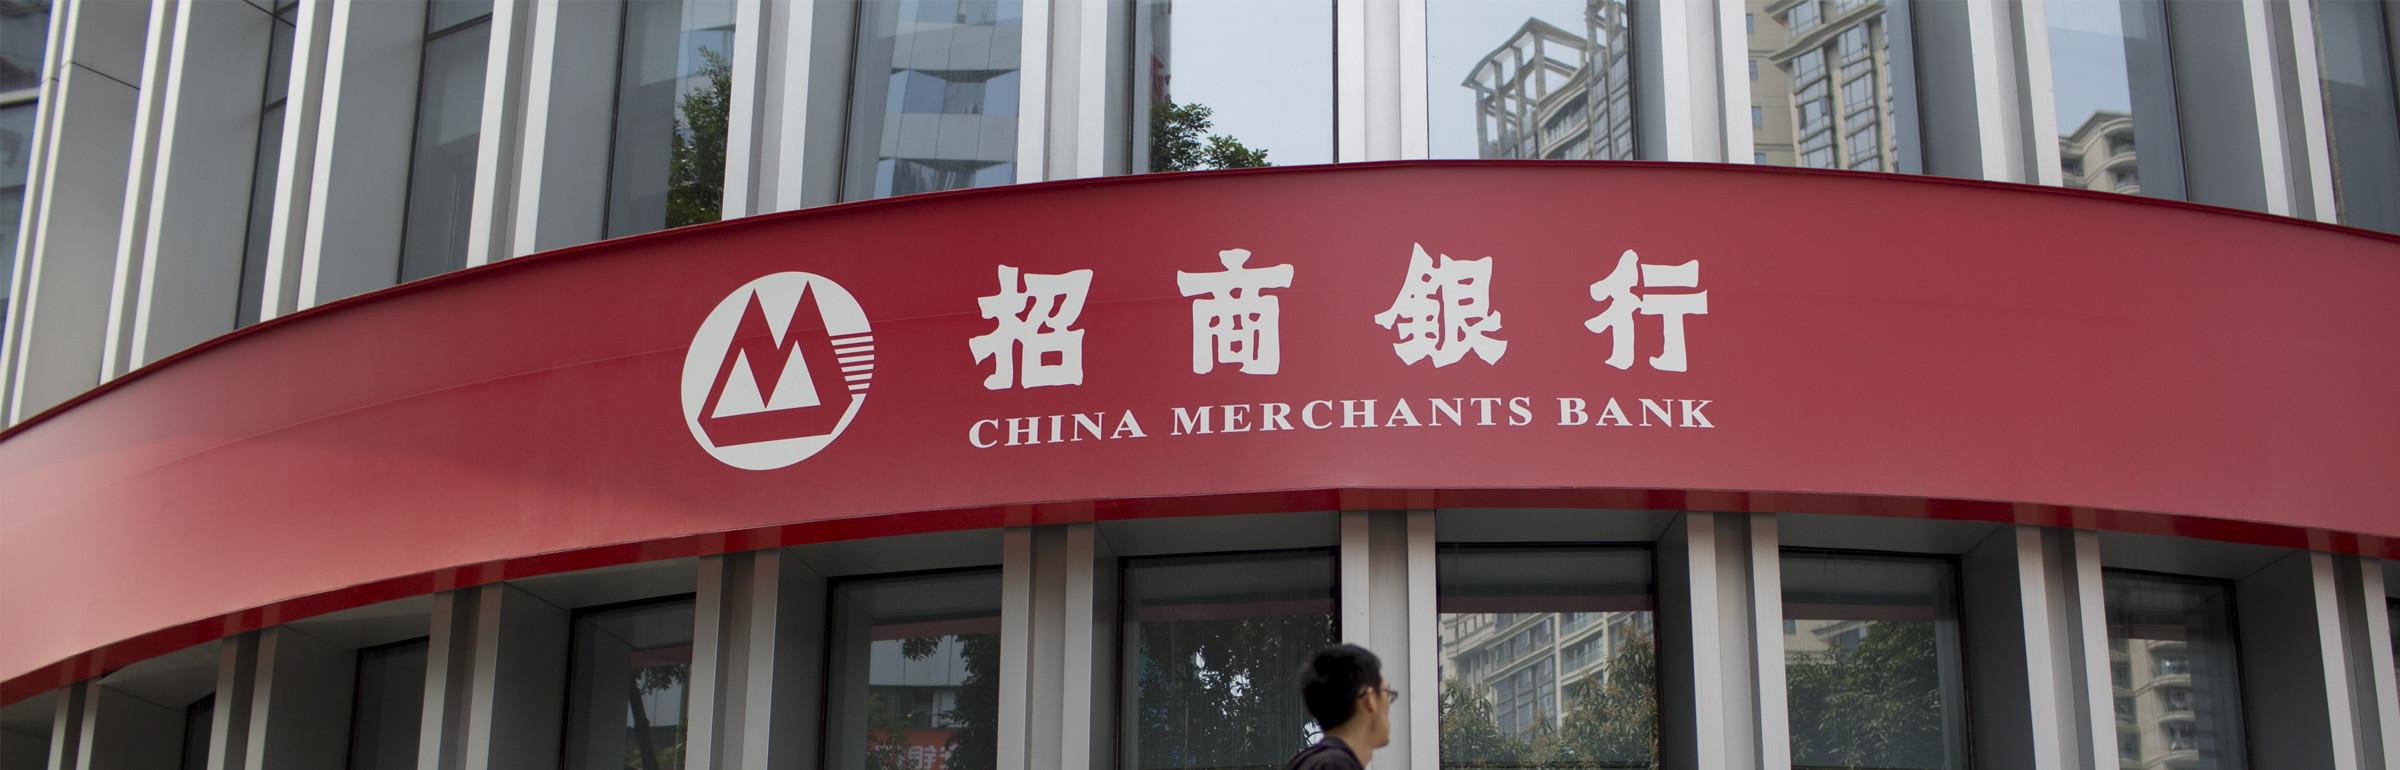 Banner China Merchants Bank